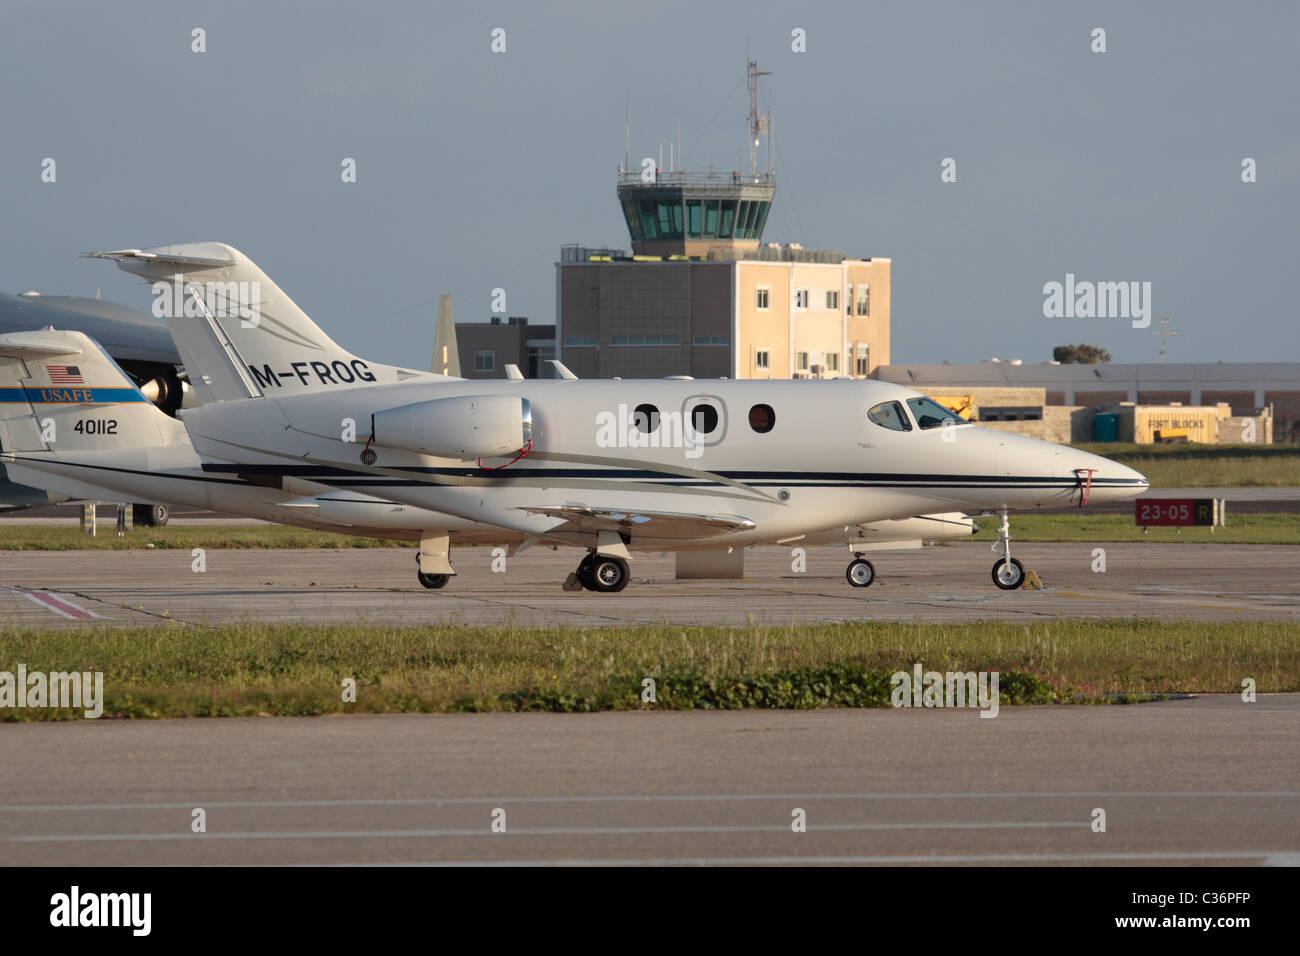 Beechcraft (formerly Raytheon) Premier IA light business jet parked at Malta International Airport - Stock Image